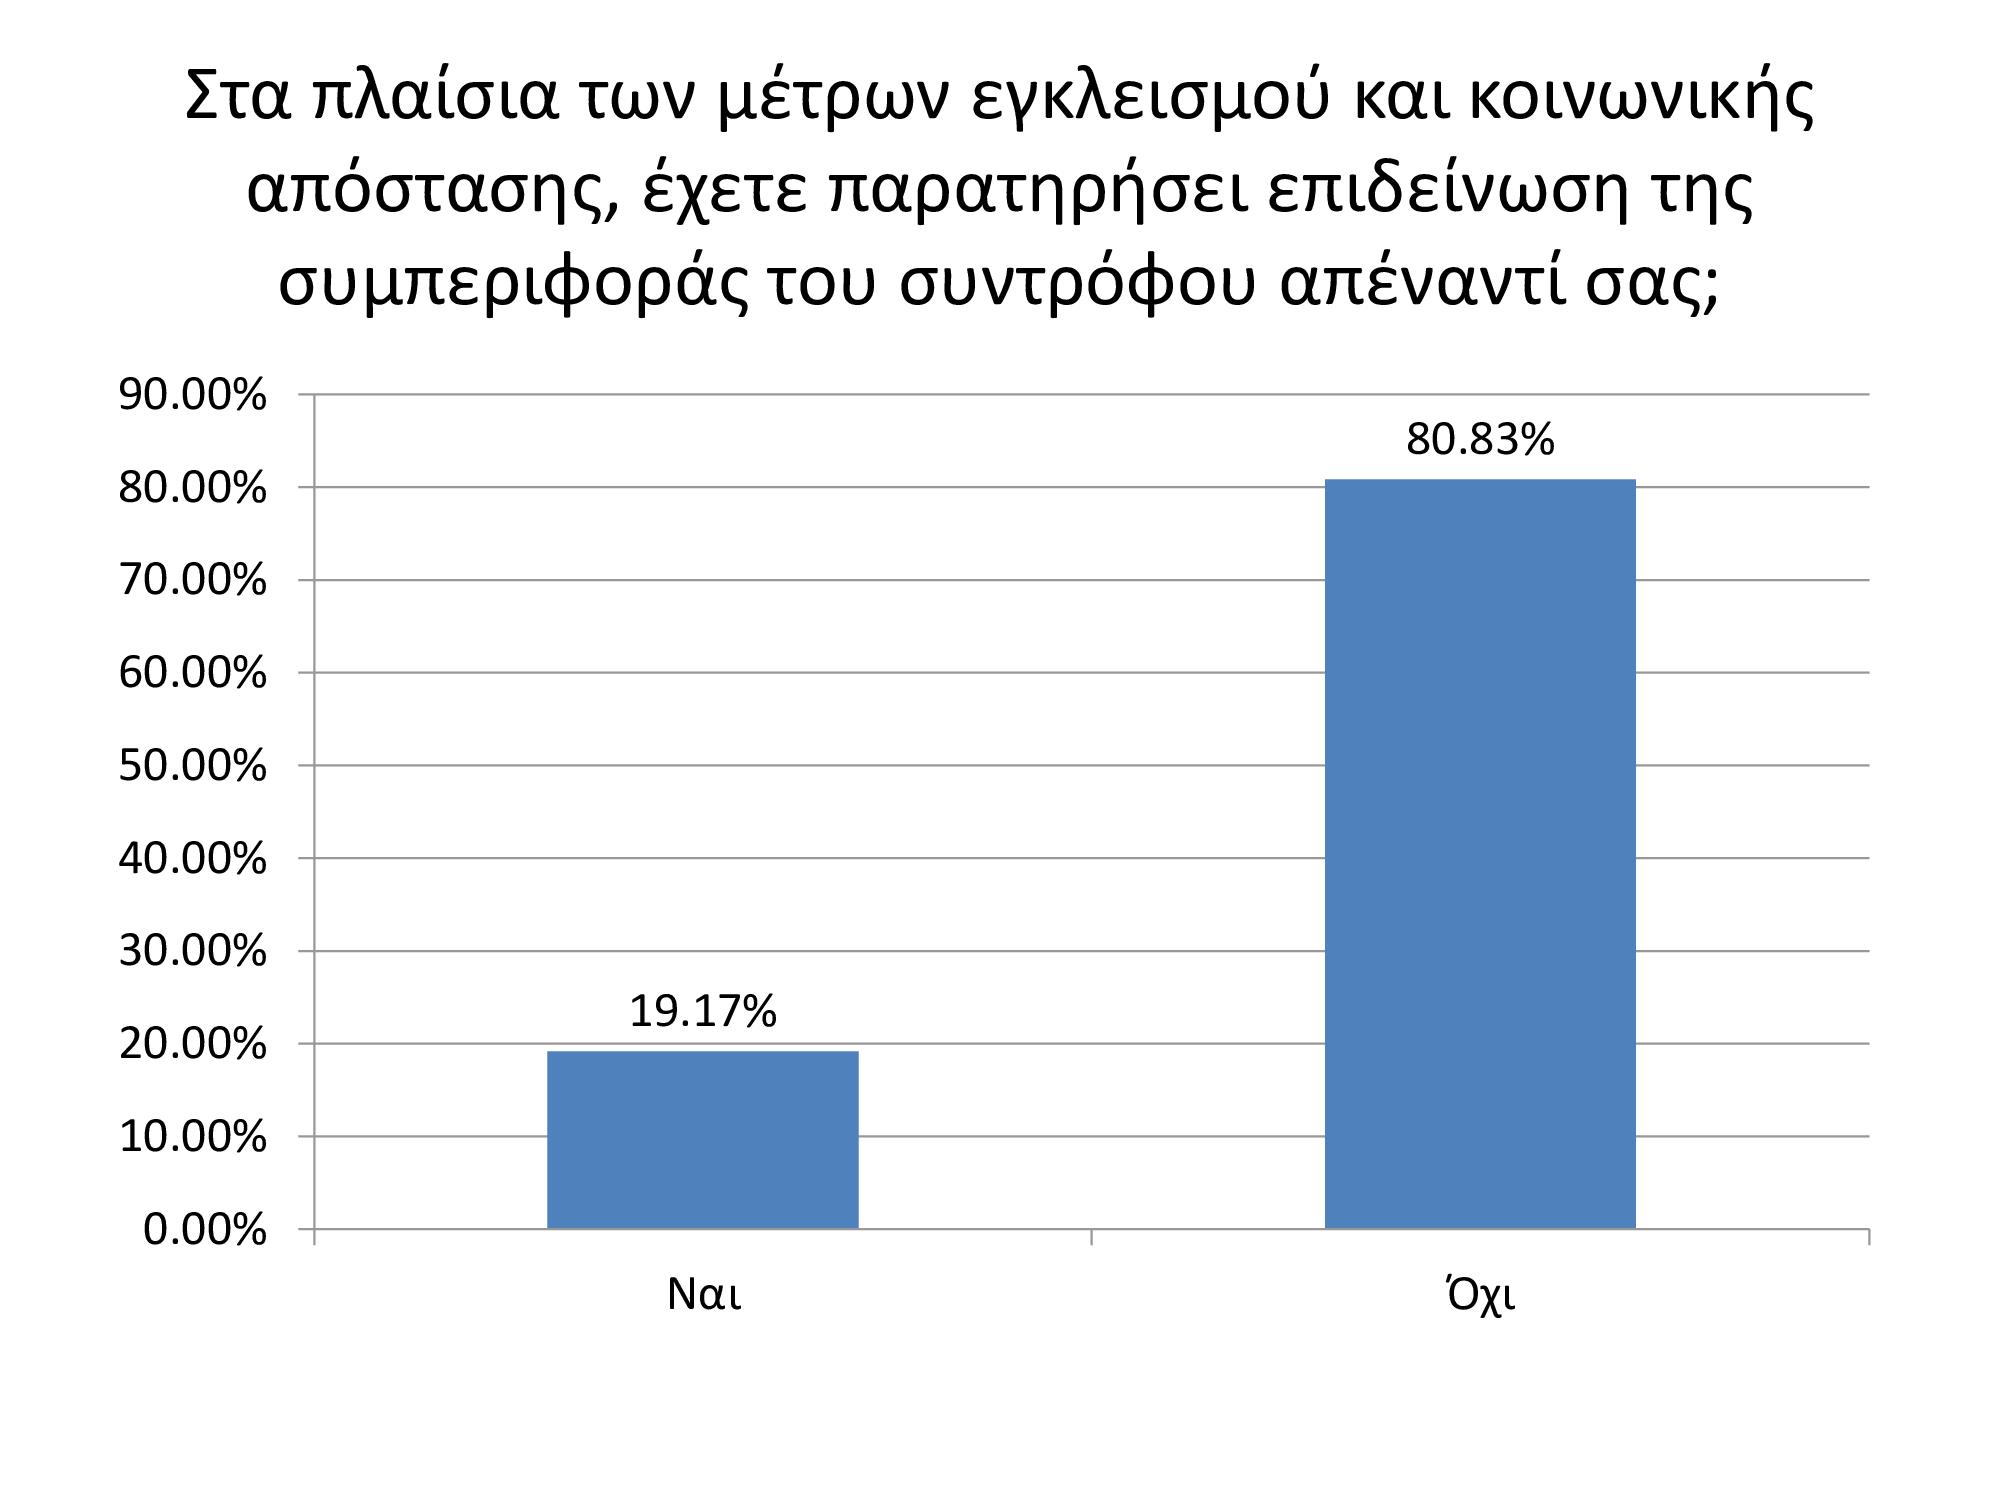 %ce%ad%cf%81%ce%b5%cf%85%ce%bd%ce%b1-%ce%b3%cf%81%ce%bf%ce%b8%ce%b9%ce%ac-%cf%84%ce%bf%cf%85-%ce%b1%ce%bd%ce%b4%cf%81%ce%bf%ce%bb%ce%bf%ce%b3%ce%b9%ce%ba%ce%bf%cf%8d-%ce%b9%ce%bd%cf%83%cf%84%ce%b95